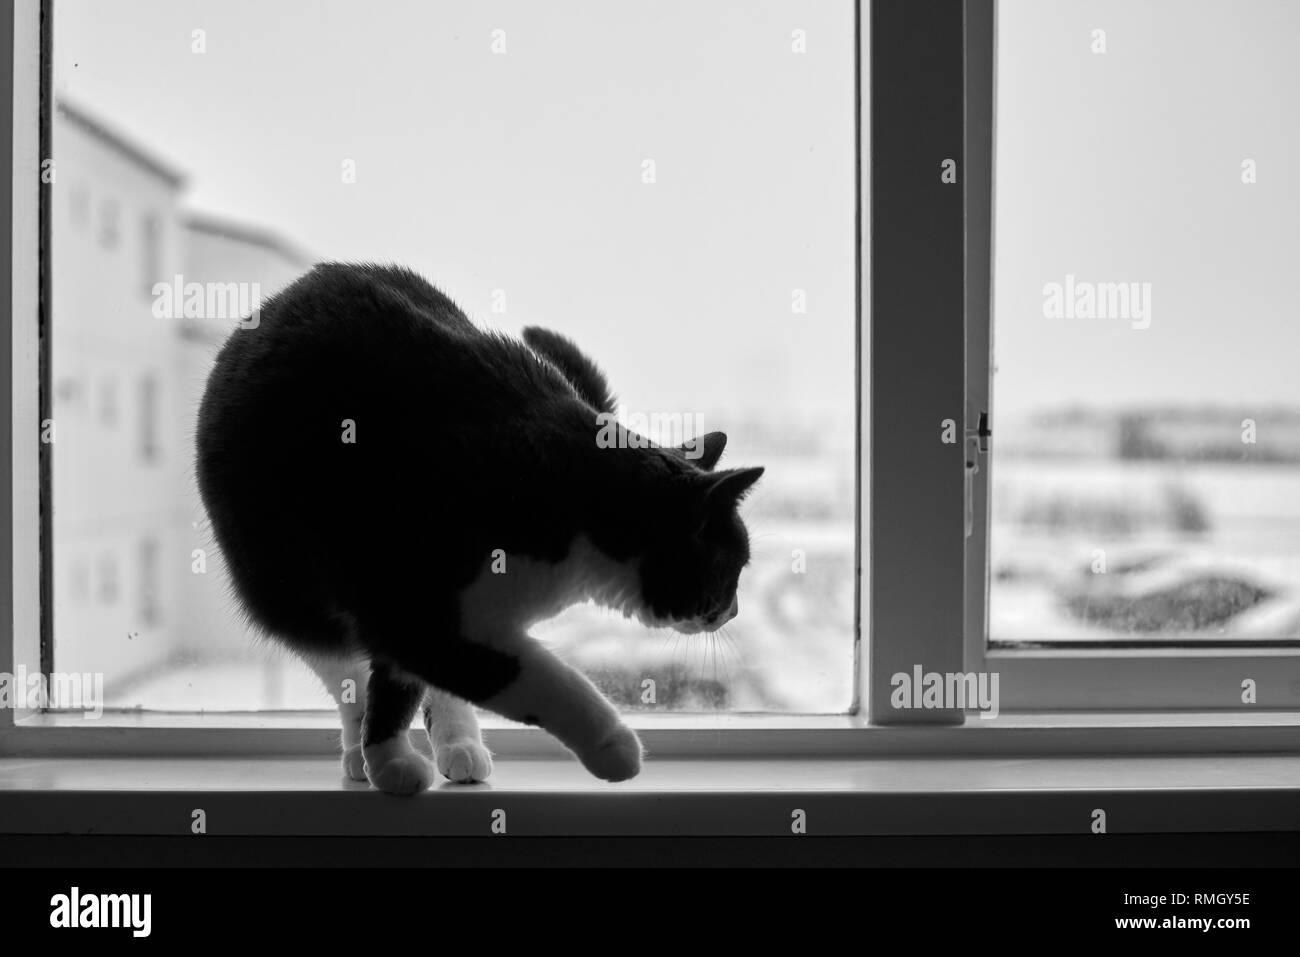 Bicolour cat on window sill. Black and white photo concept. Stock Photo